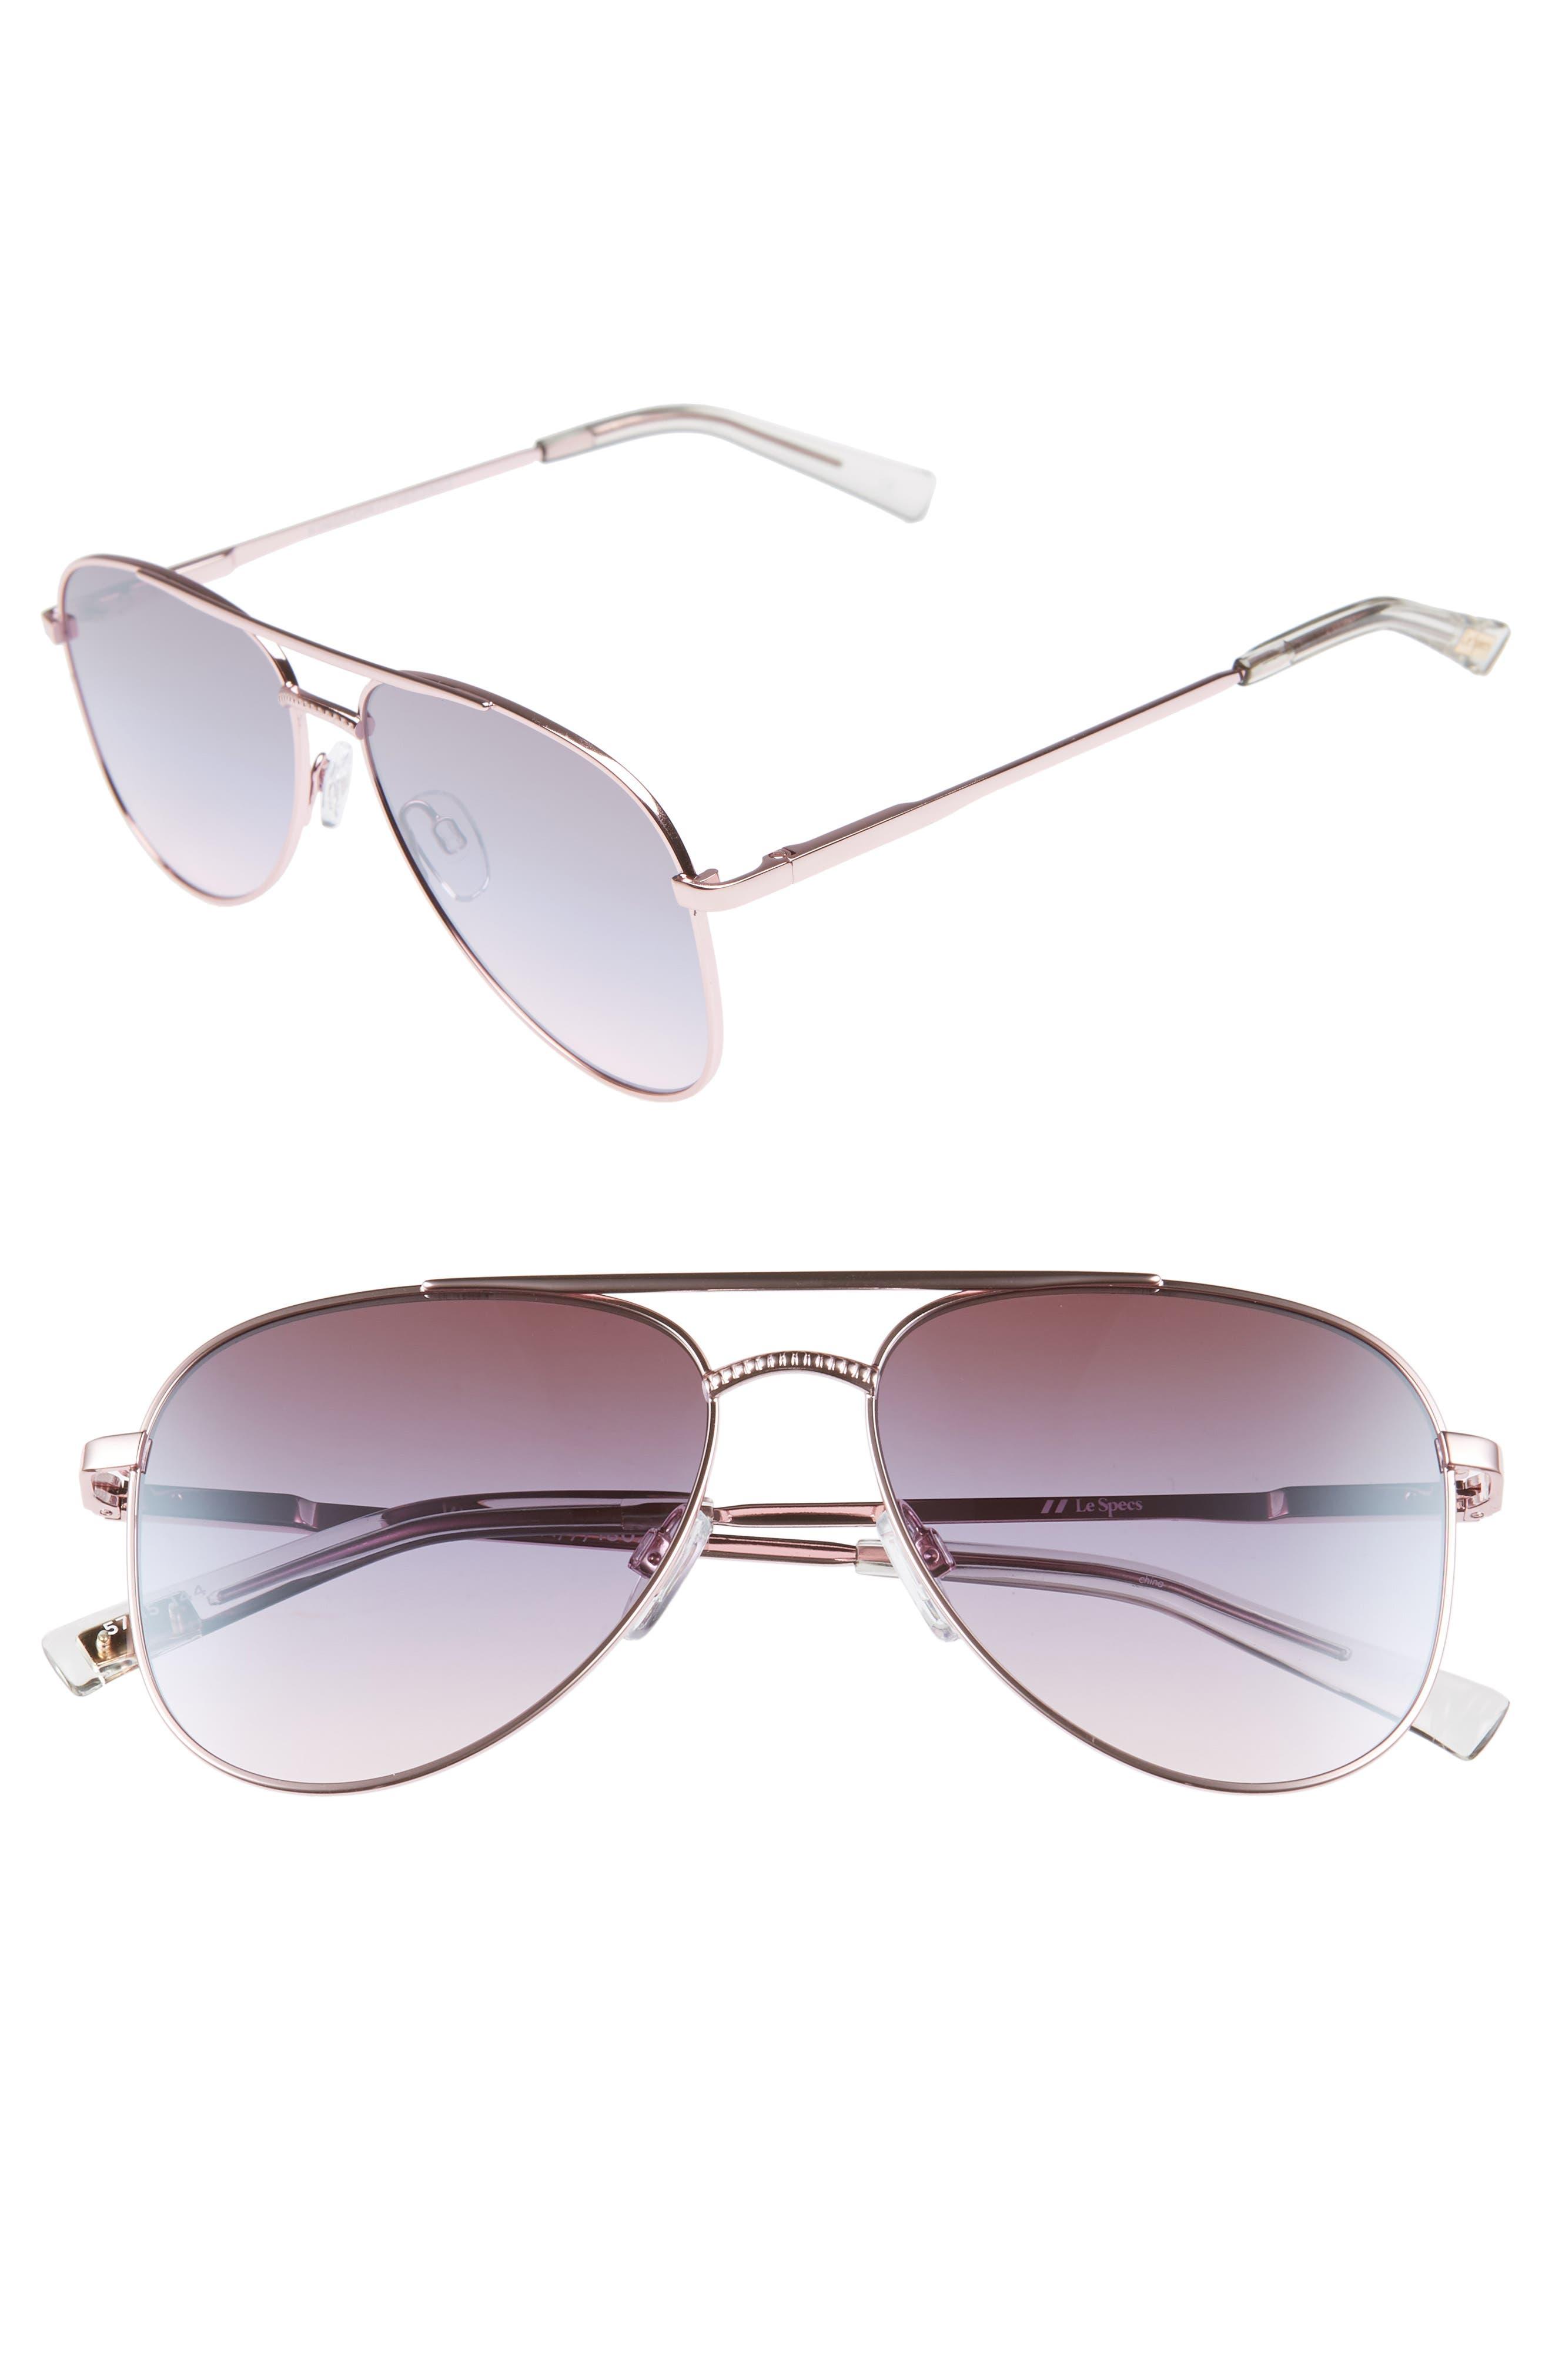 Kingdom 57mm Aviator Sunglasses,                             Main thumbnail 1, color,                             ROSE GOLD